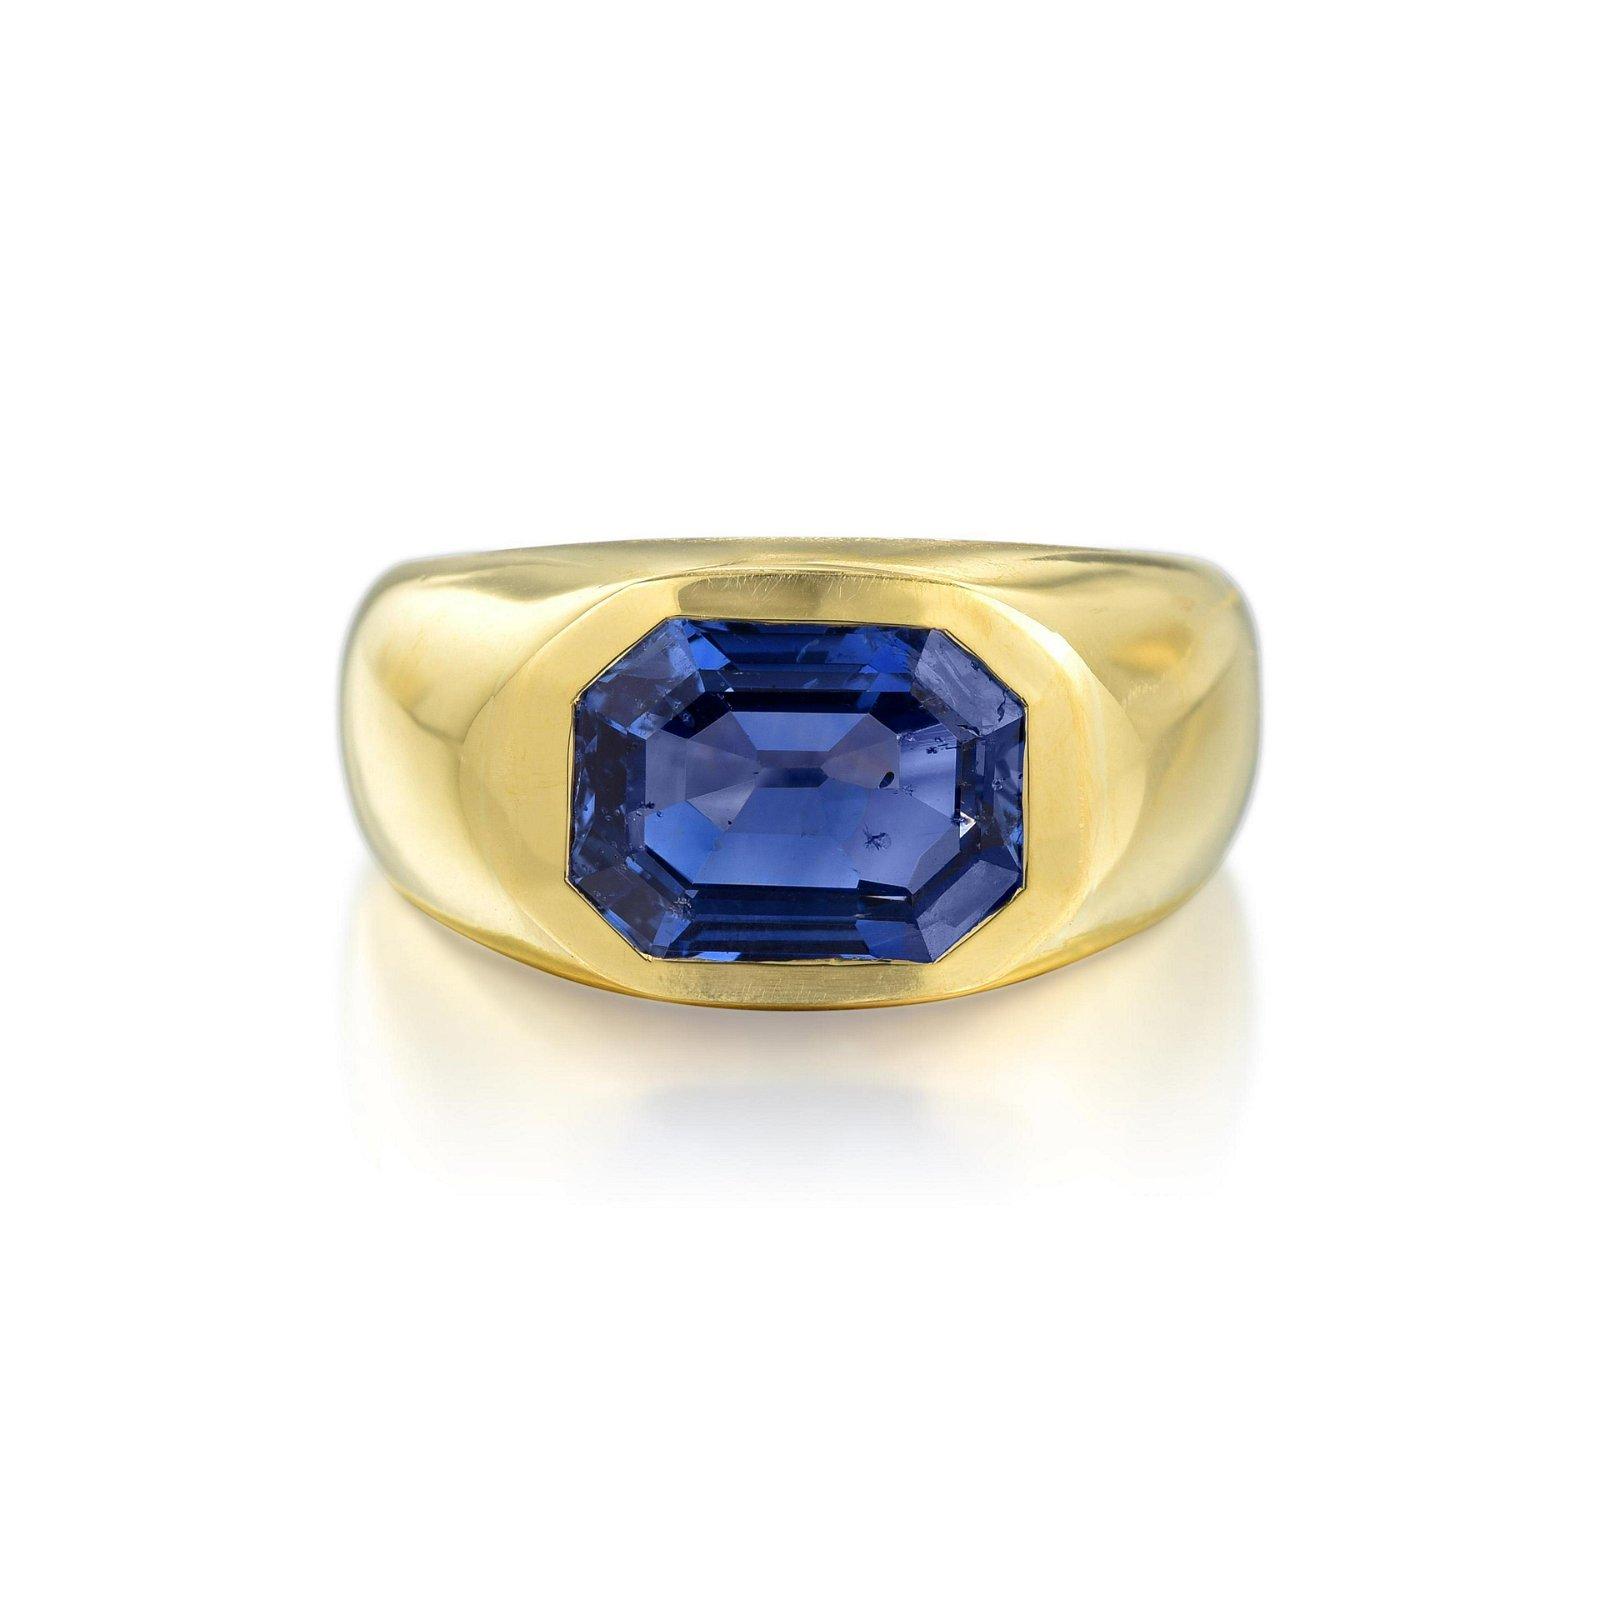 Bulgari 3.78-Carat Sapphire Ring